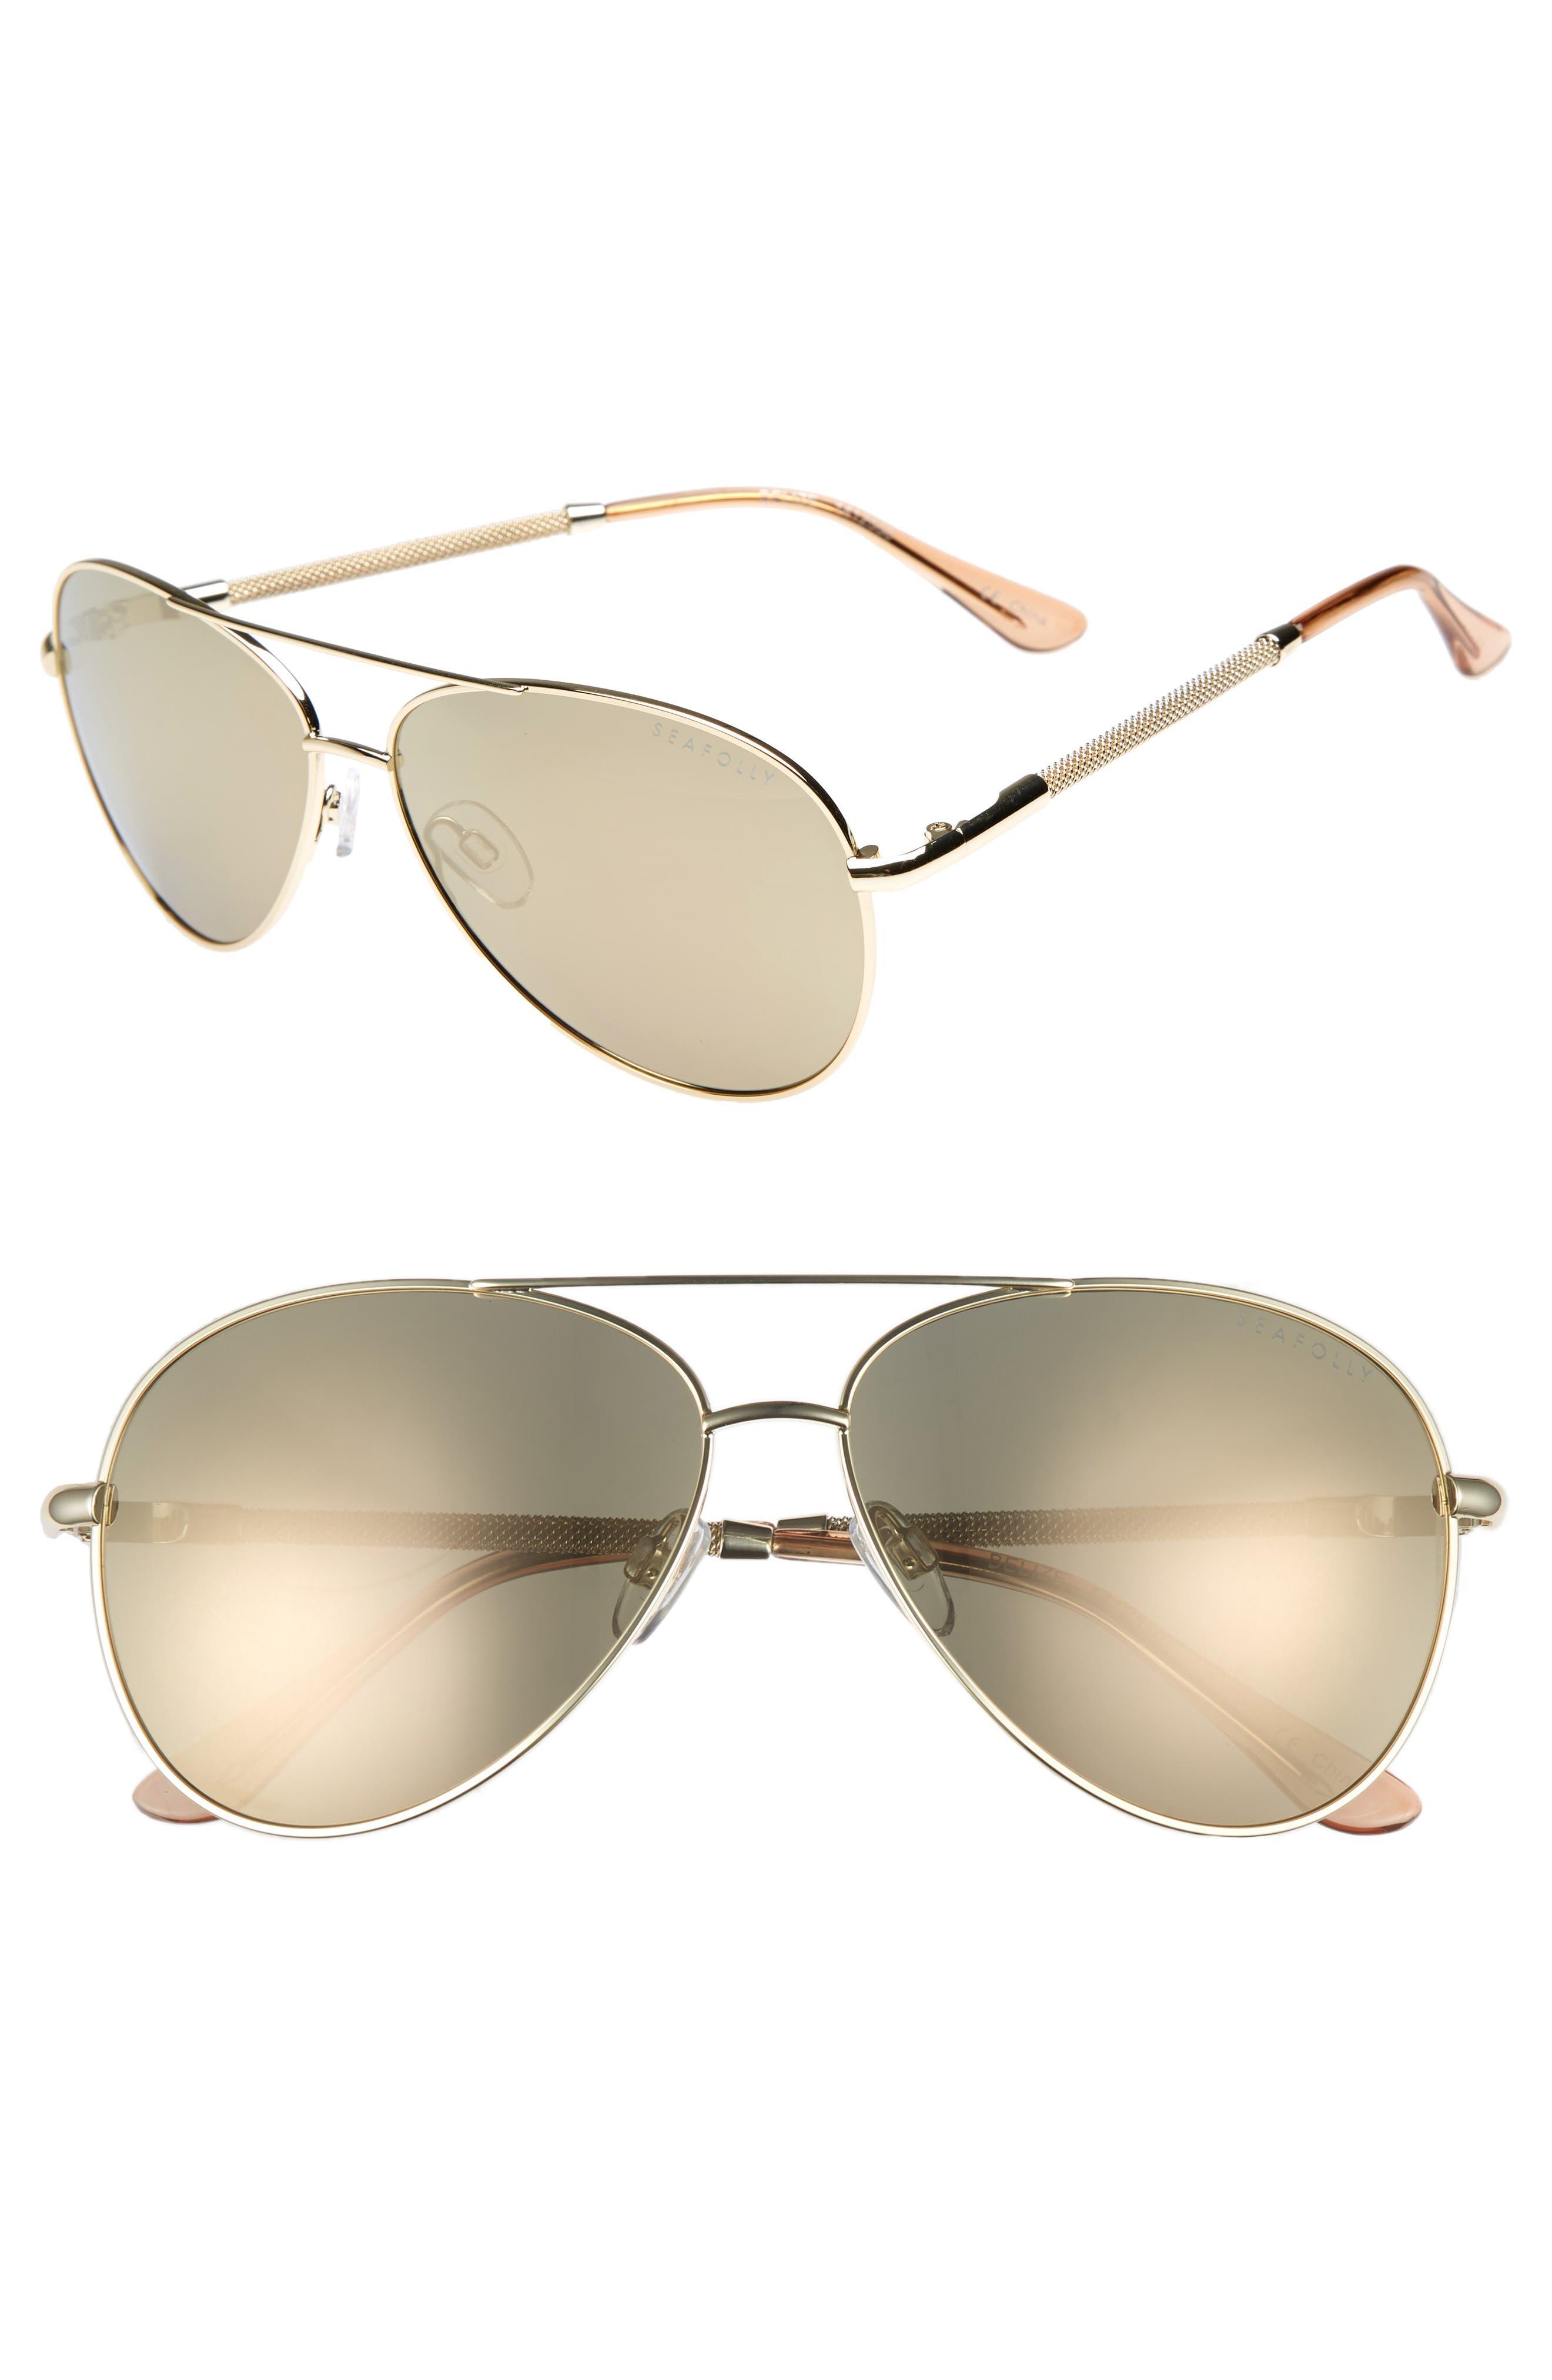 Belize 59mm Aviator Sunglasses,                             Main thumbnail 1, color,                             710